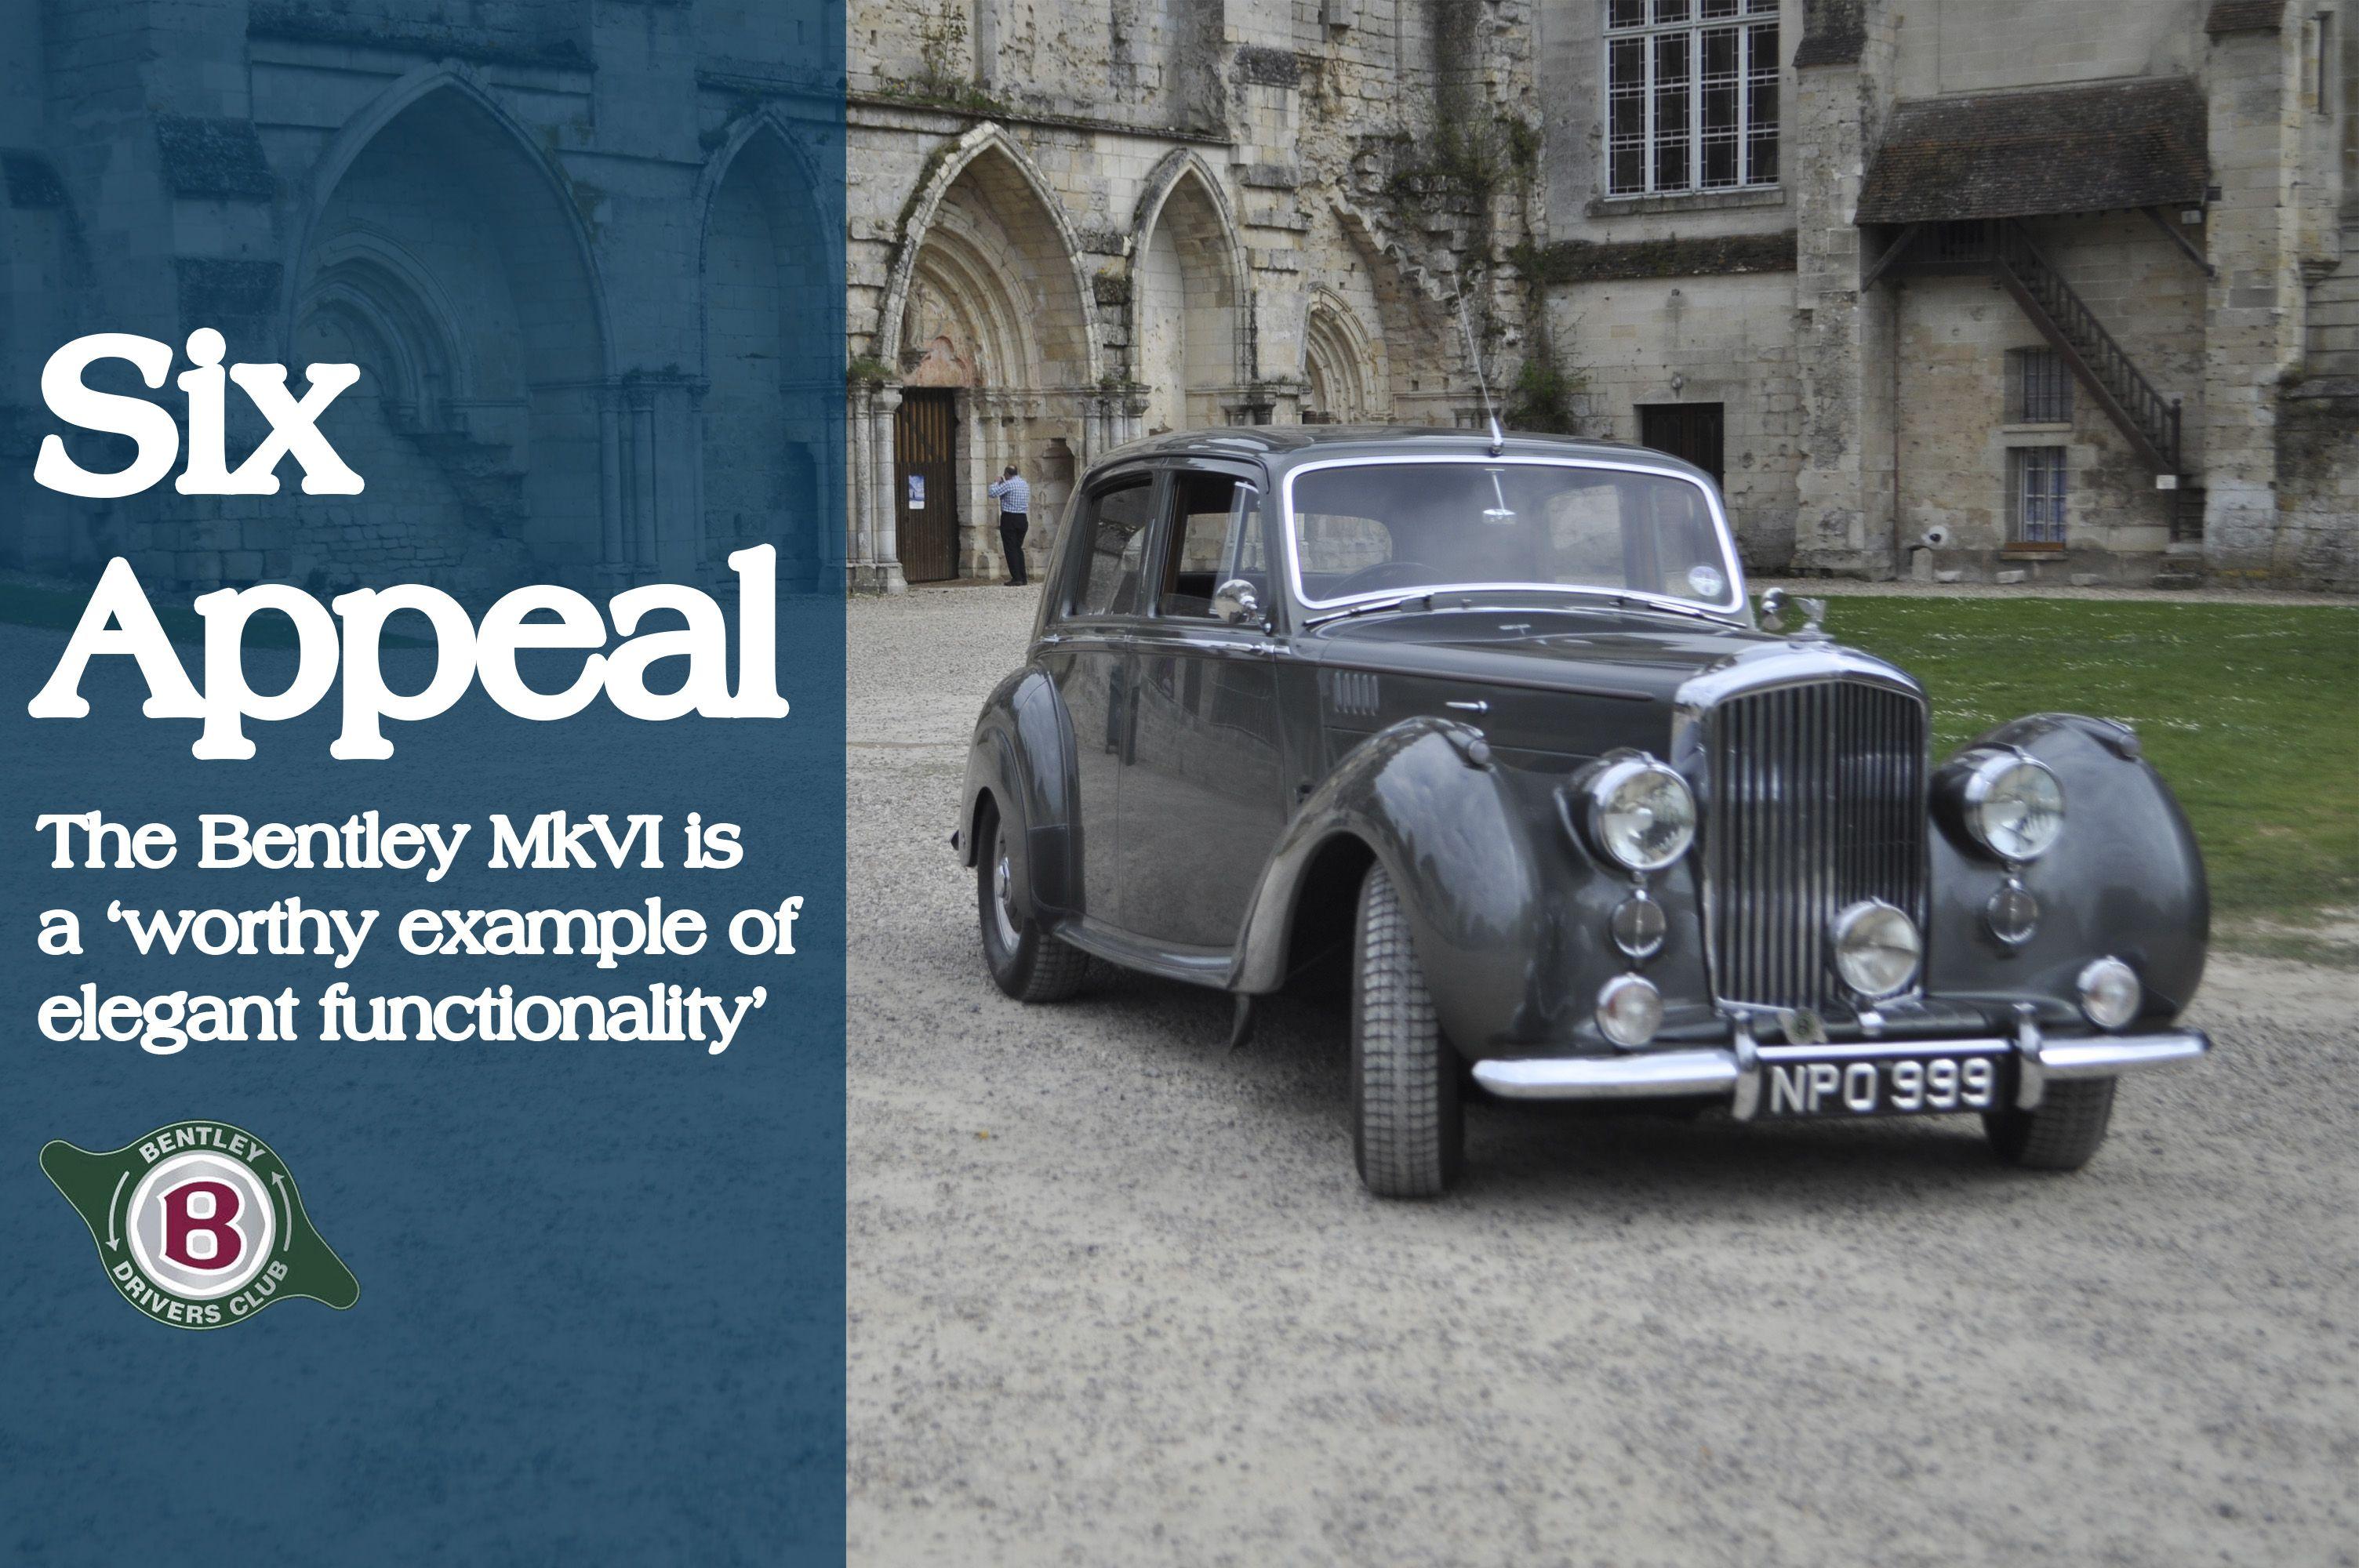 Six Appeal – The Bentley MkVI is a 'worthy example of elegant functionality'